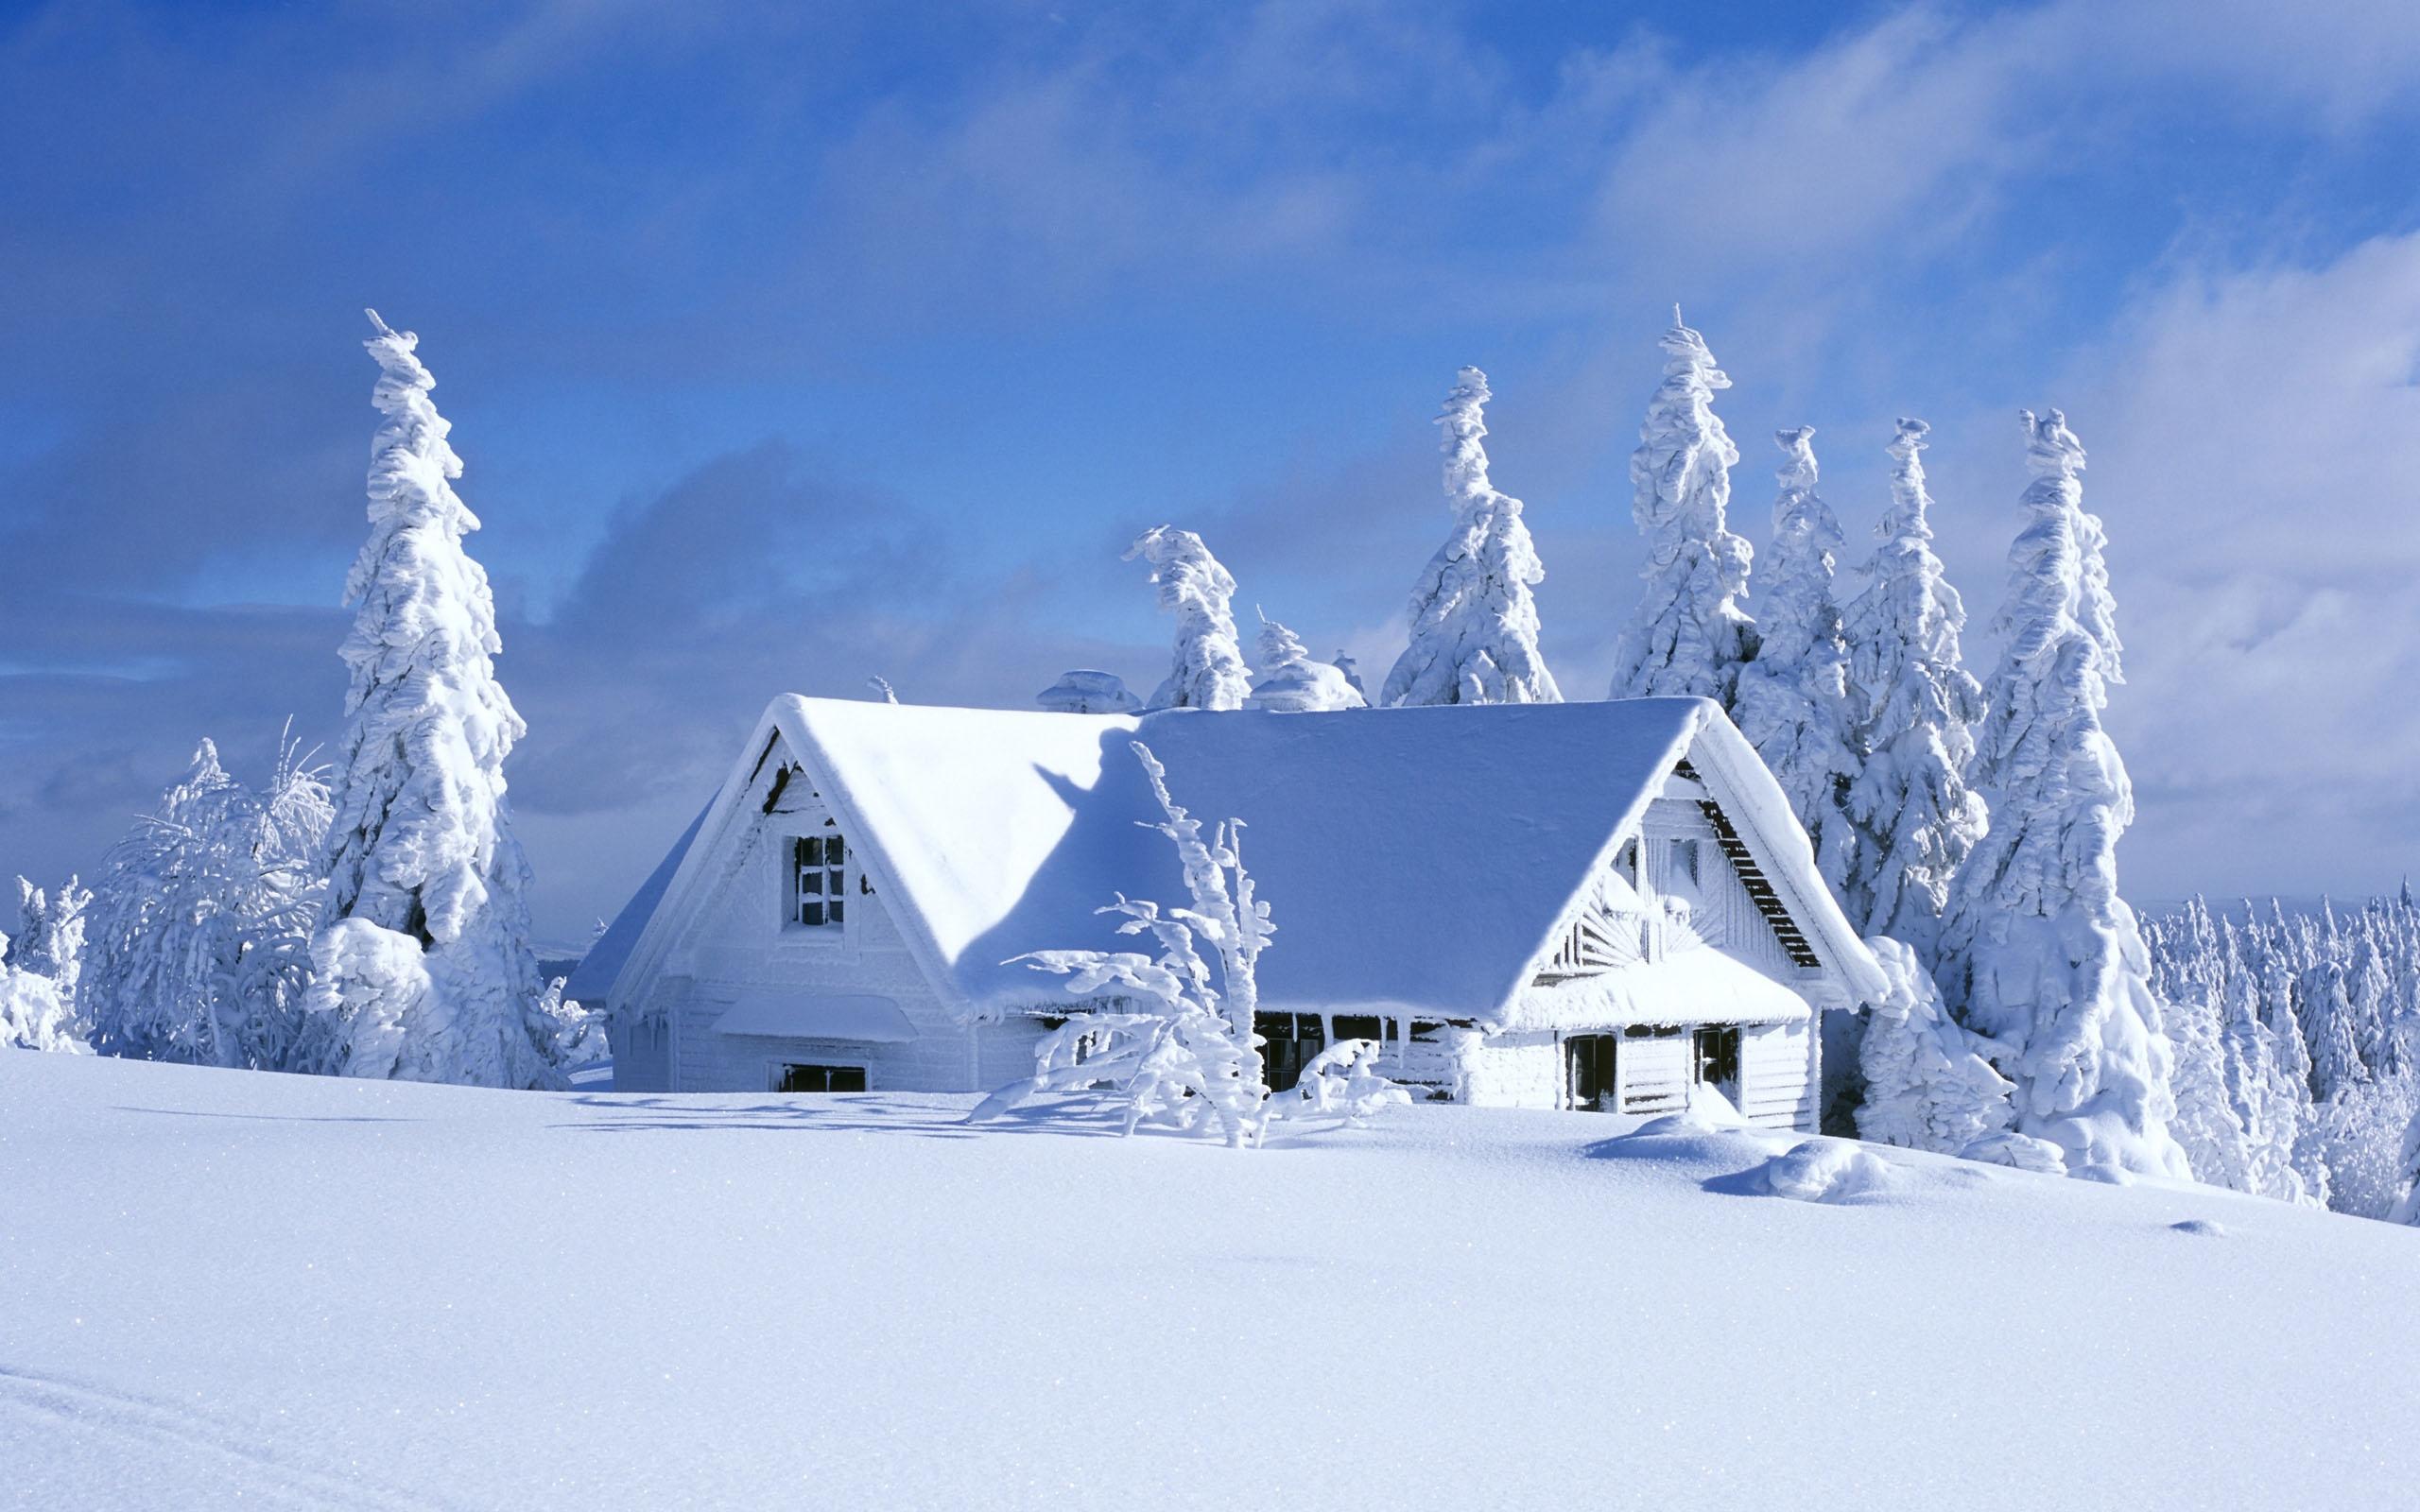 Winter HD Wallpapers Winter Desktop Wallpapers Nature Winter 2560x1600